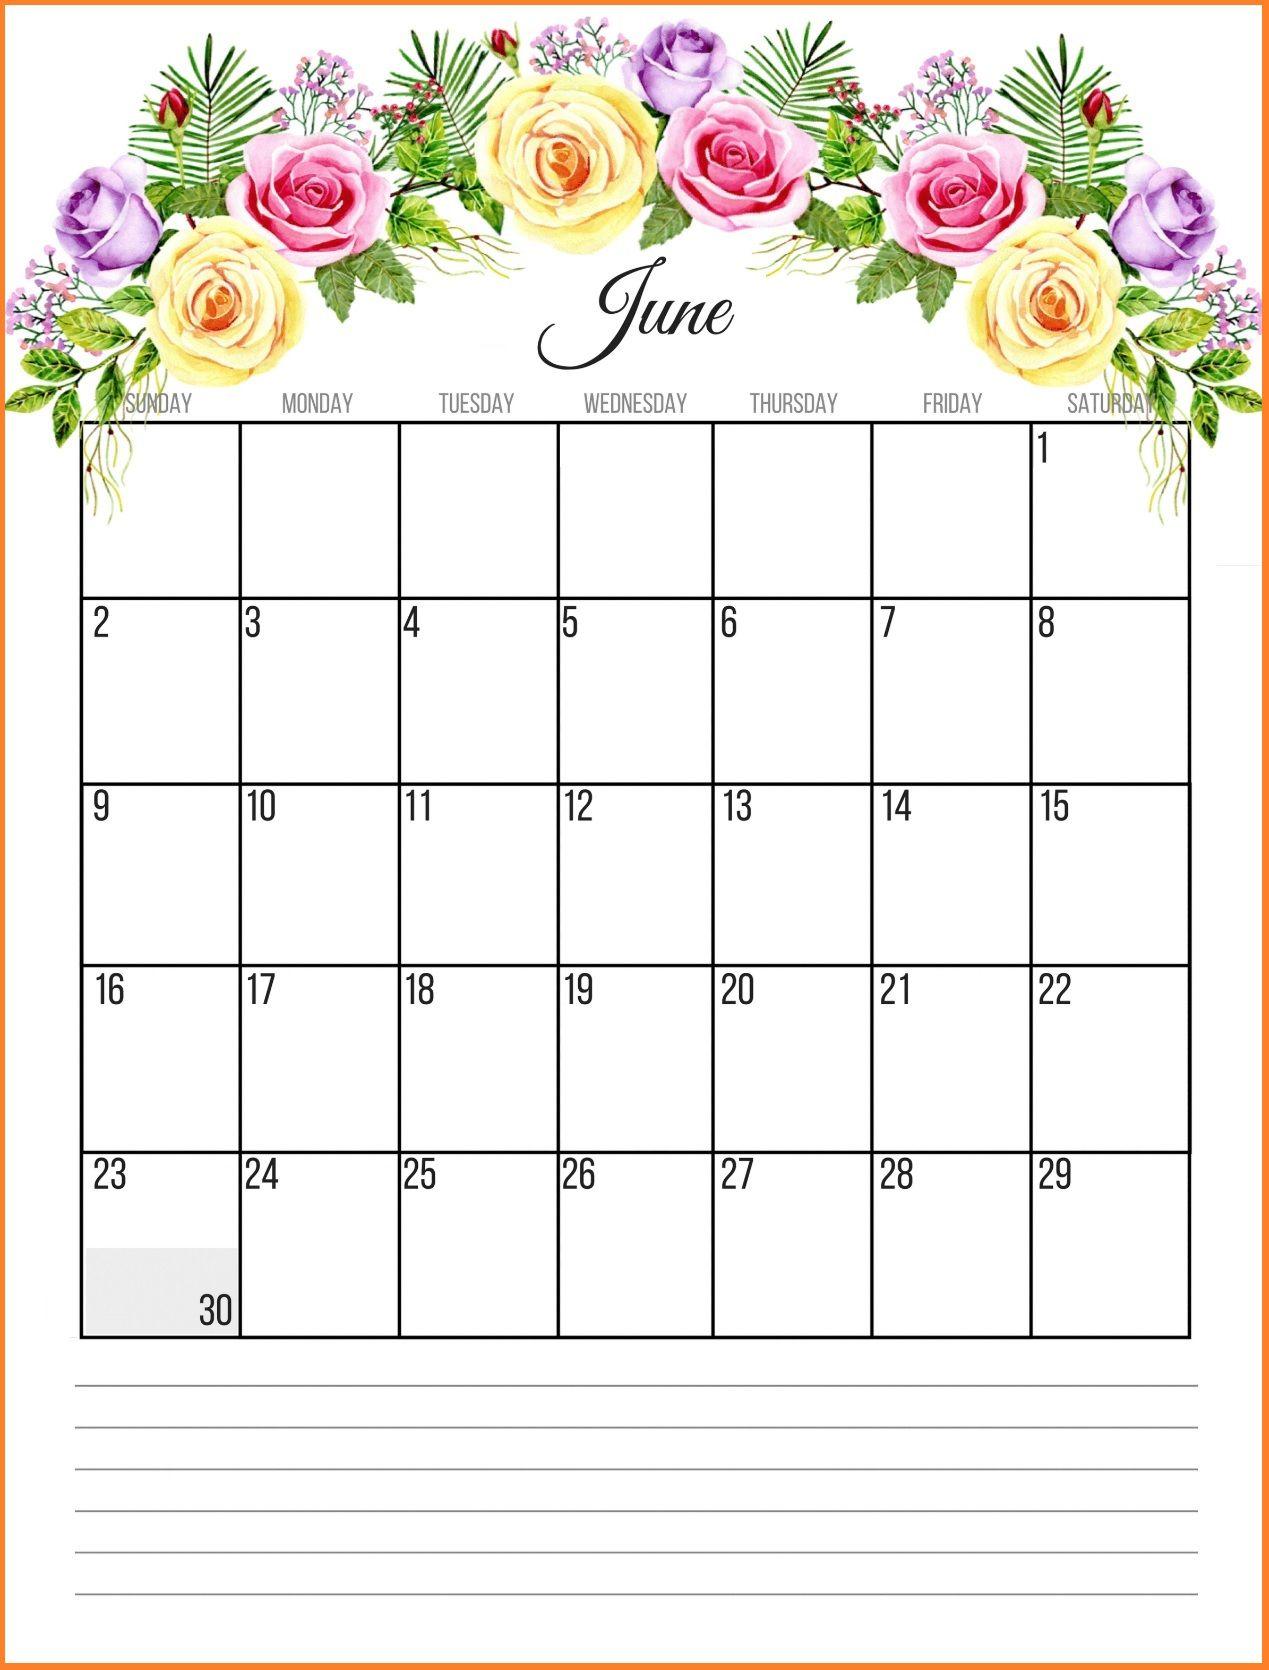 June 2019 Floral Calendar | Paper crafts | June 2019 calendar